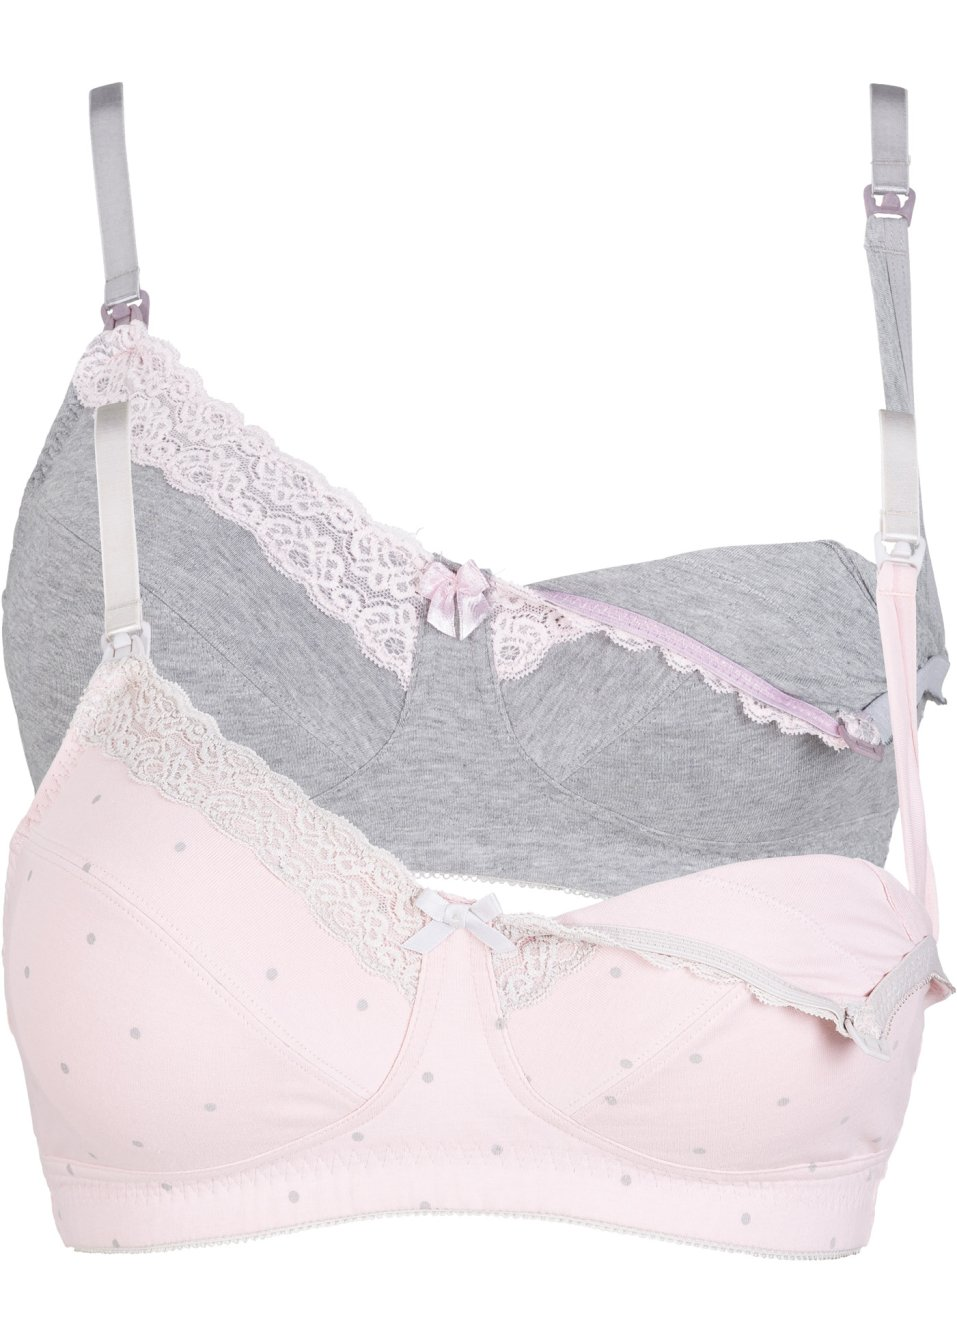 Still BH (2er Pack) Bio-Baumwolle graumeliert + rosa - bpc bonprix collection - Nice Size - bonprix.de XAo0l 58GQq